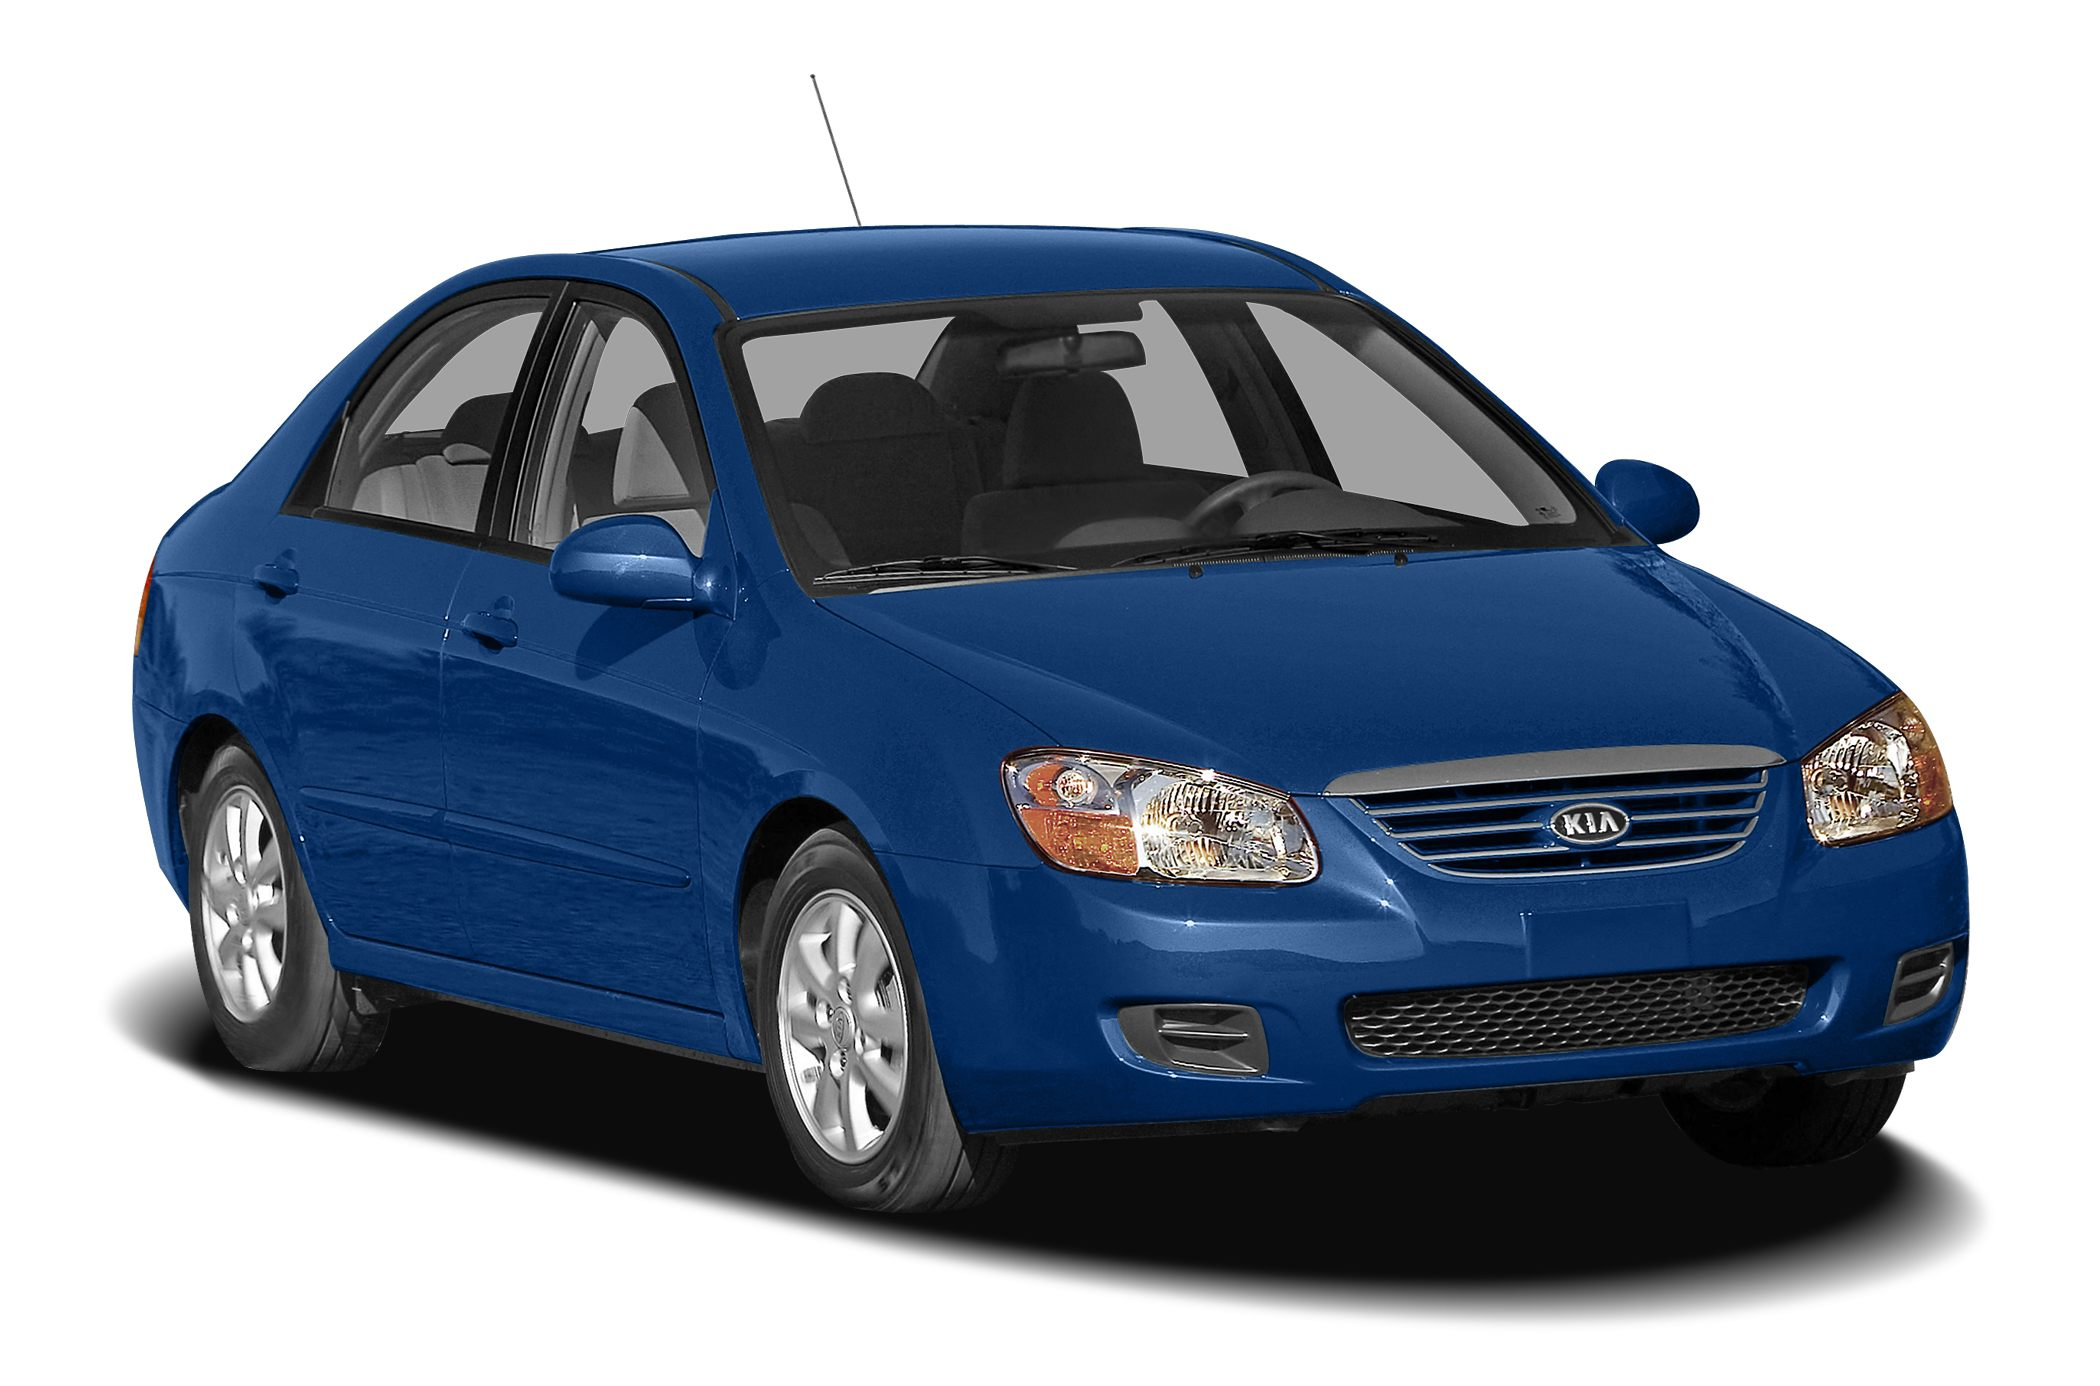 2007 Kia Spectra EX Sedan for sale in Nashville for $7,850 with 84,221 miles.